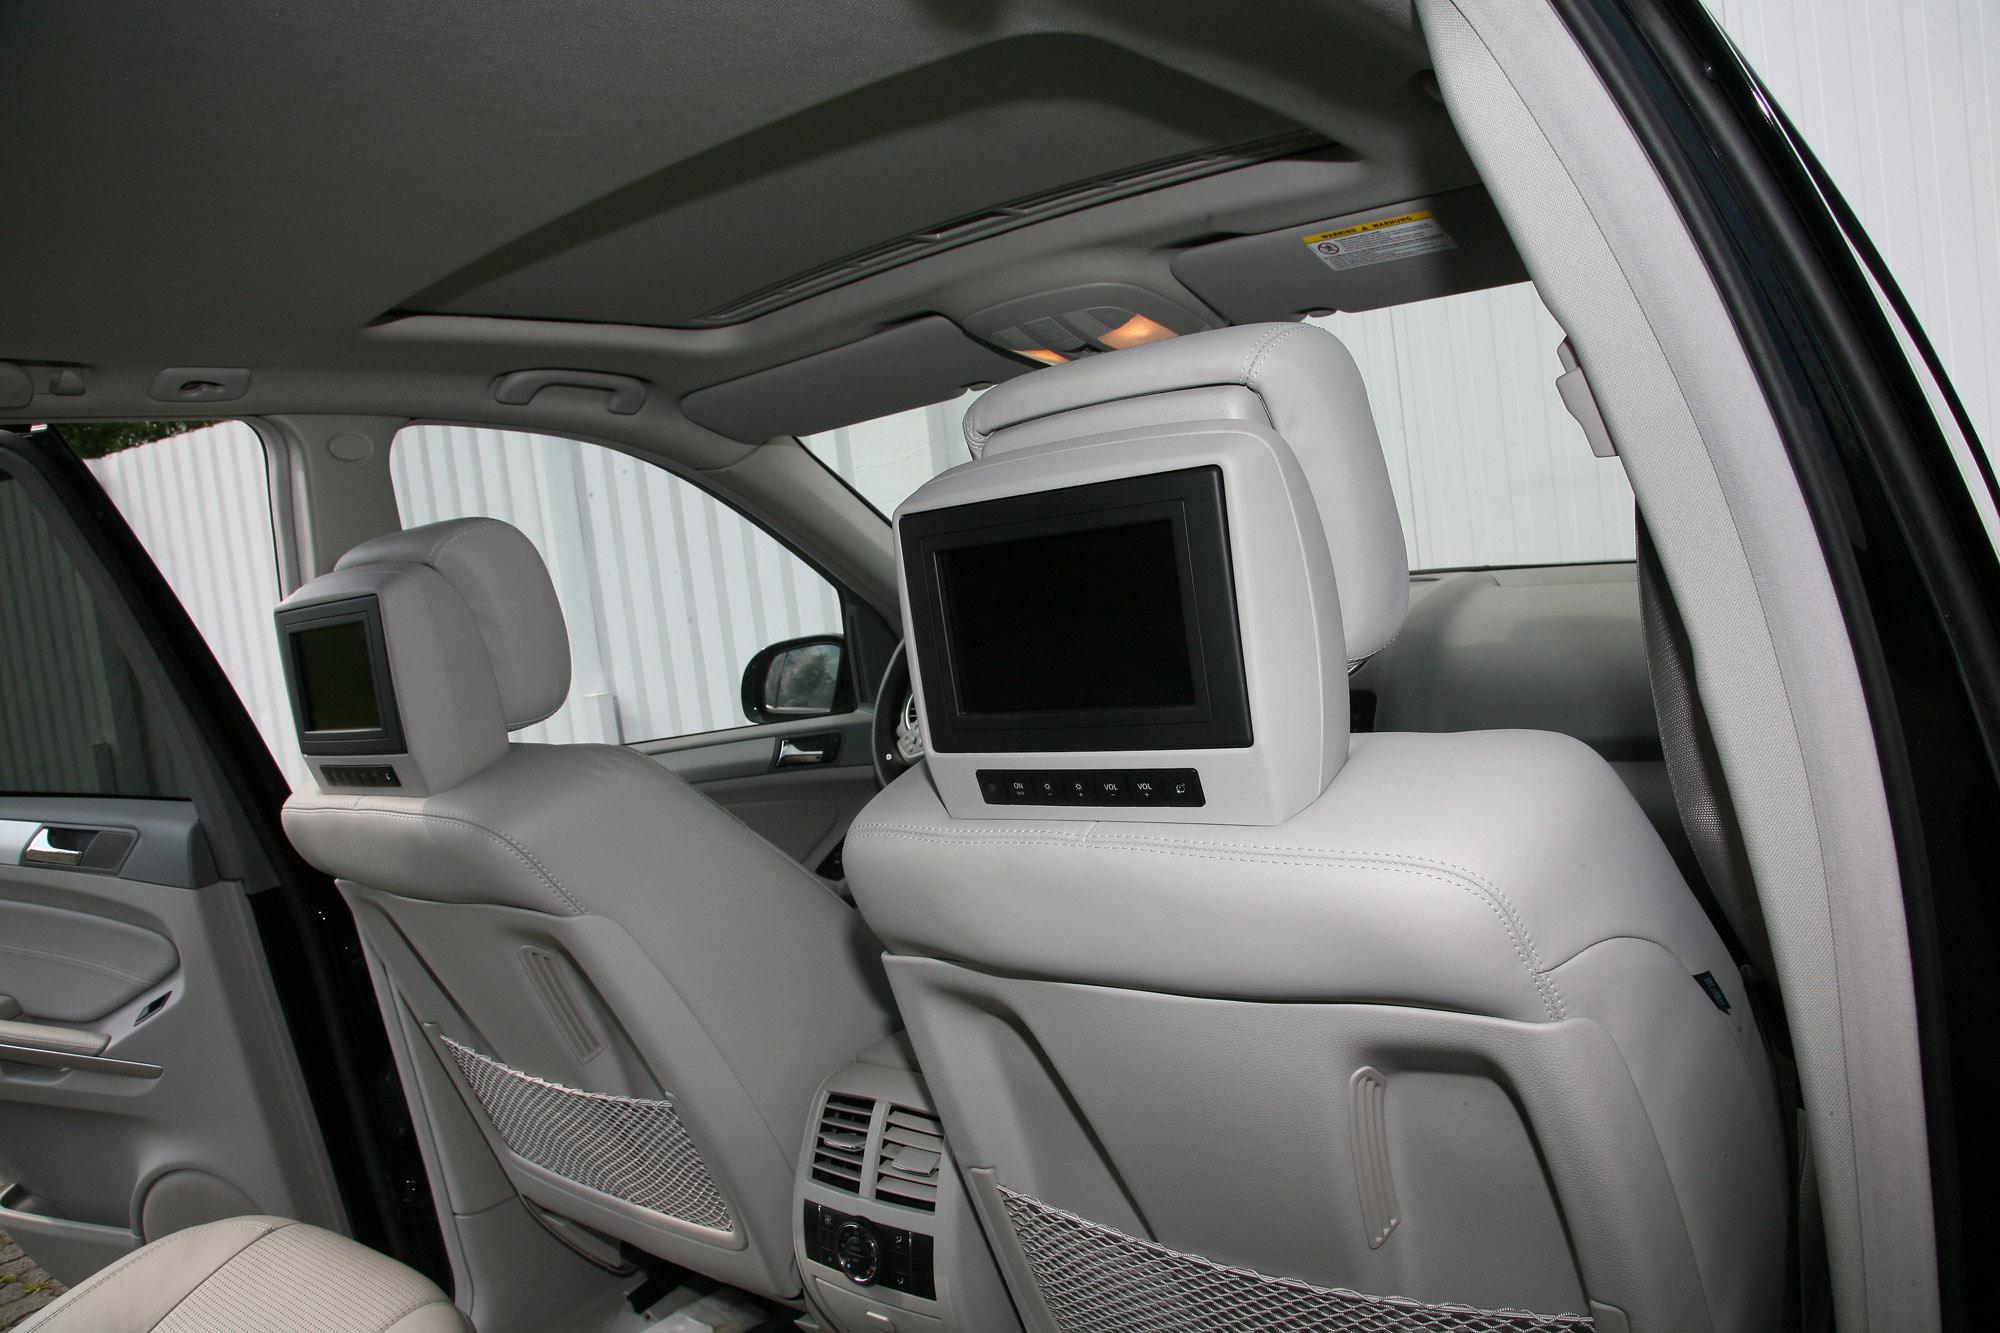 VATH Mercedes-Benz ML63 AMG - фотография №8